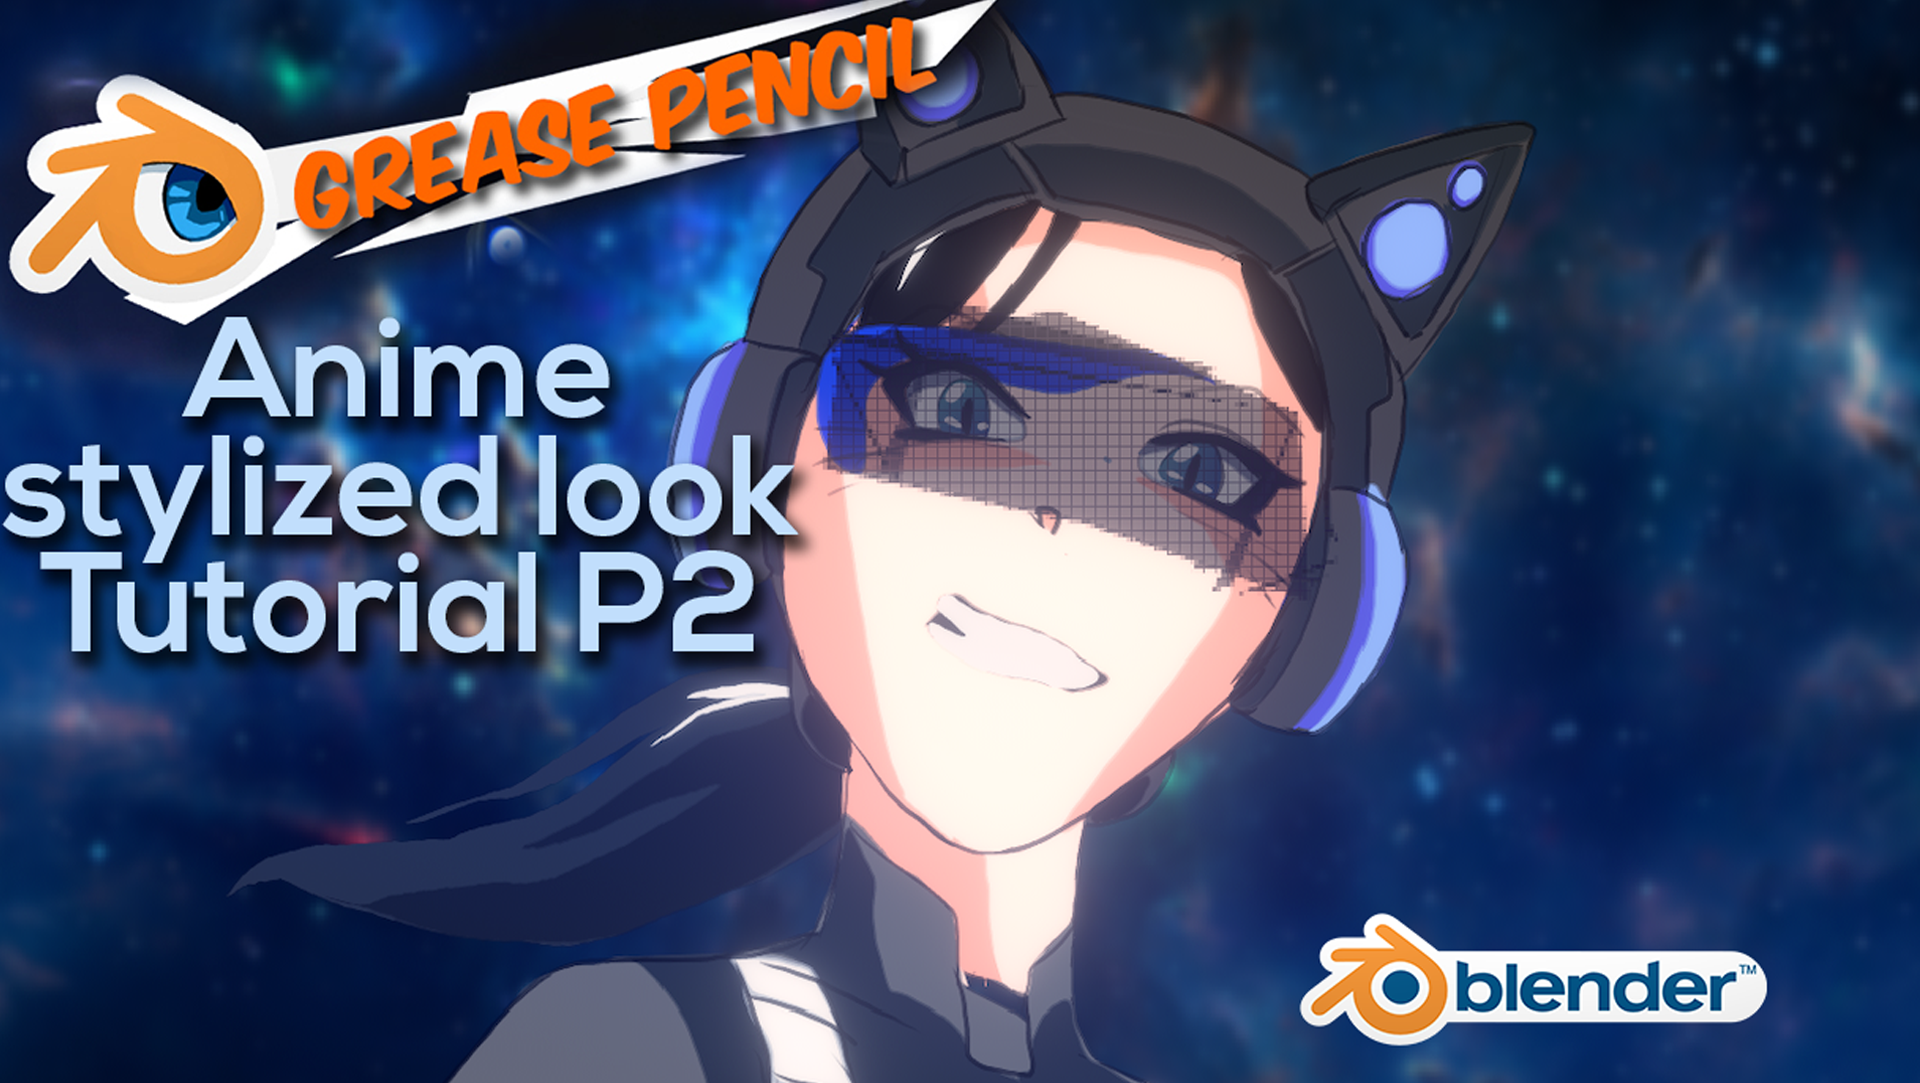 Anime stylized look in Blender grease pencil Neko girl